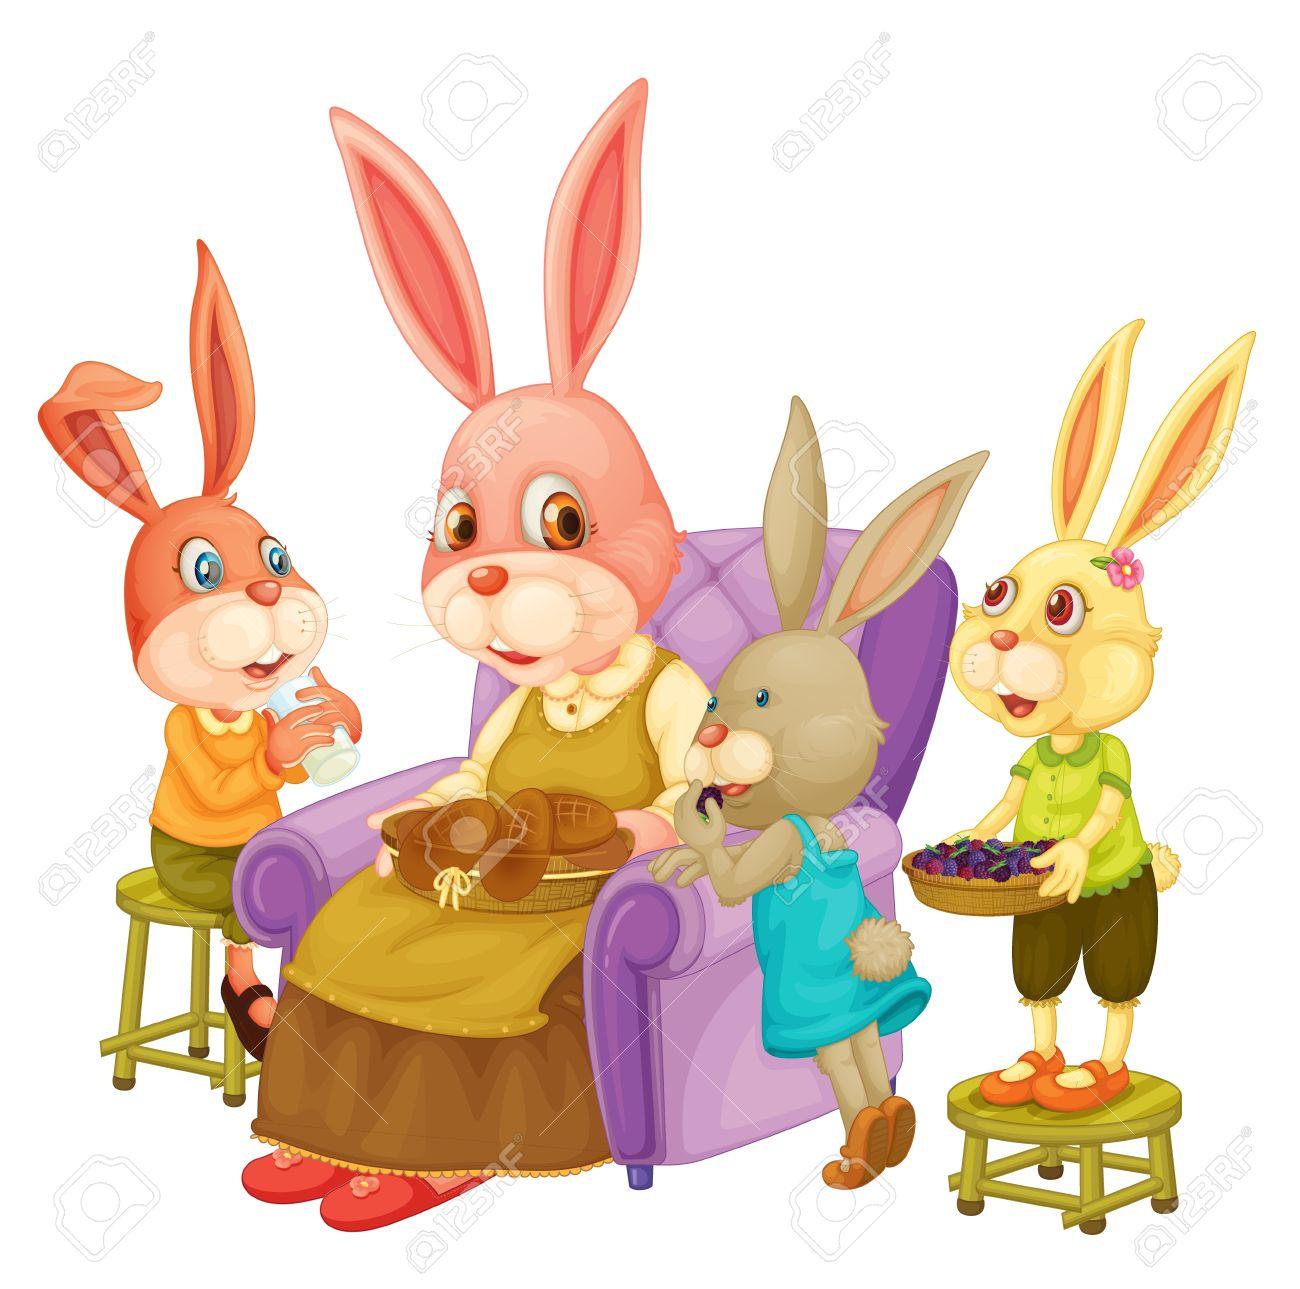 Illustration of family of rabbits Stock Vector - 13190236